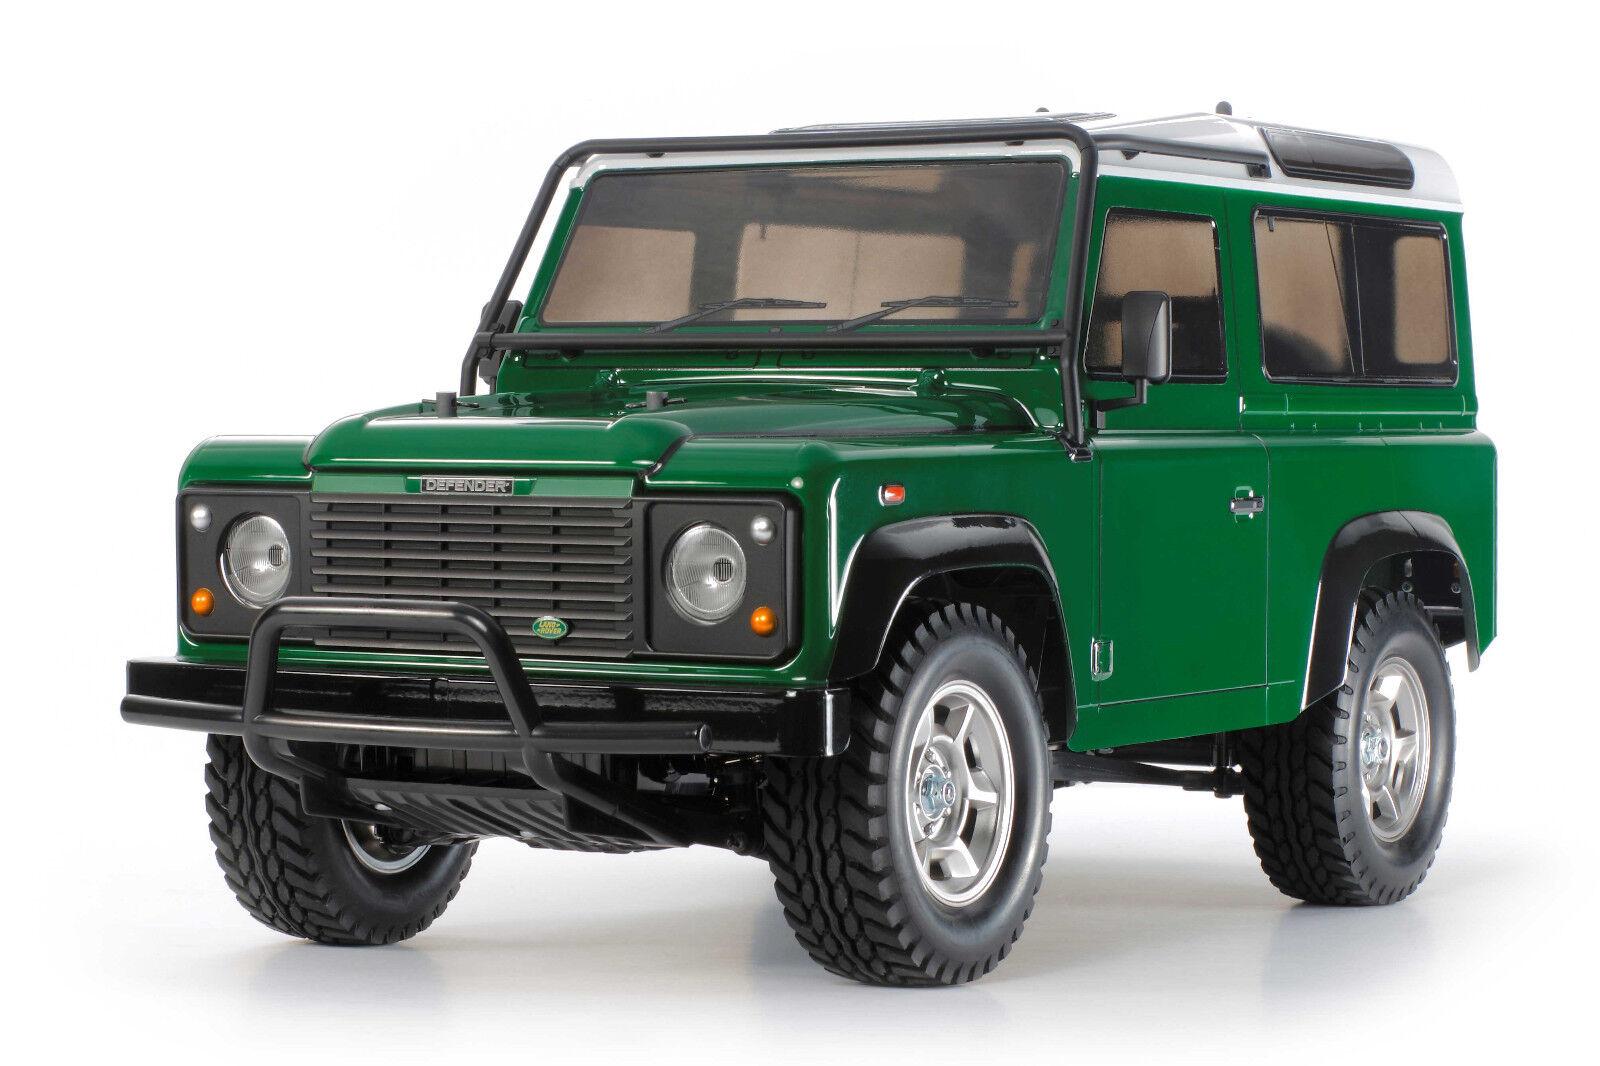 58657 Tamiya Land Rover Defender 90 CC-01 R C Kit FAST CHARGER Combo